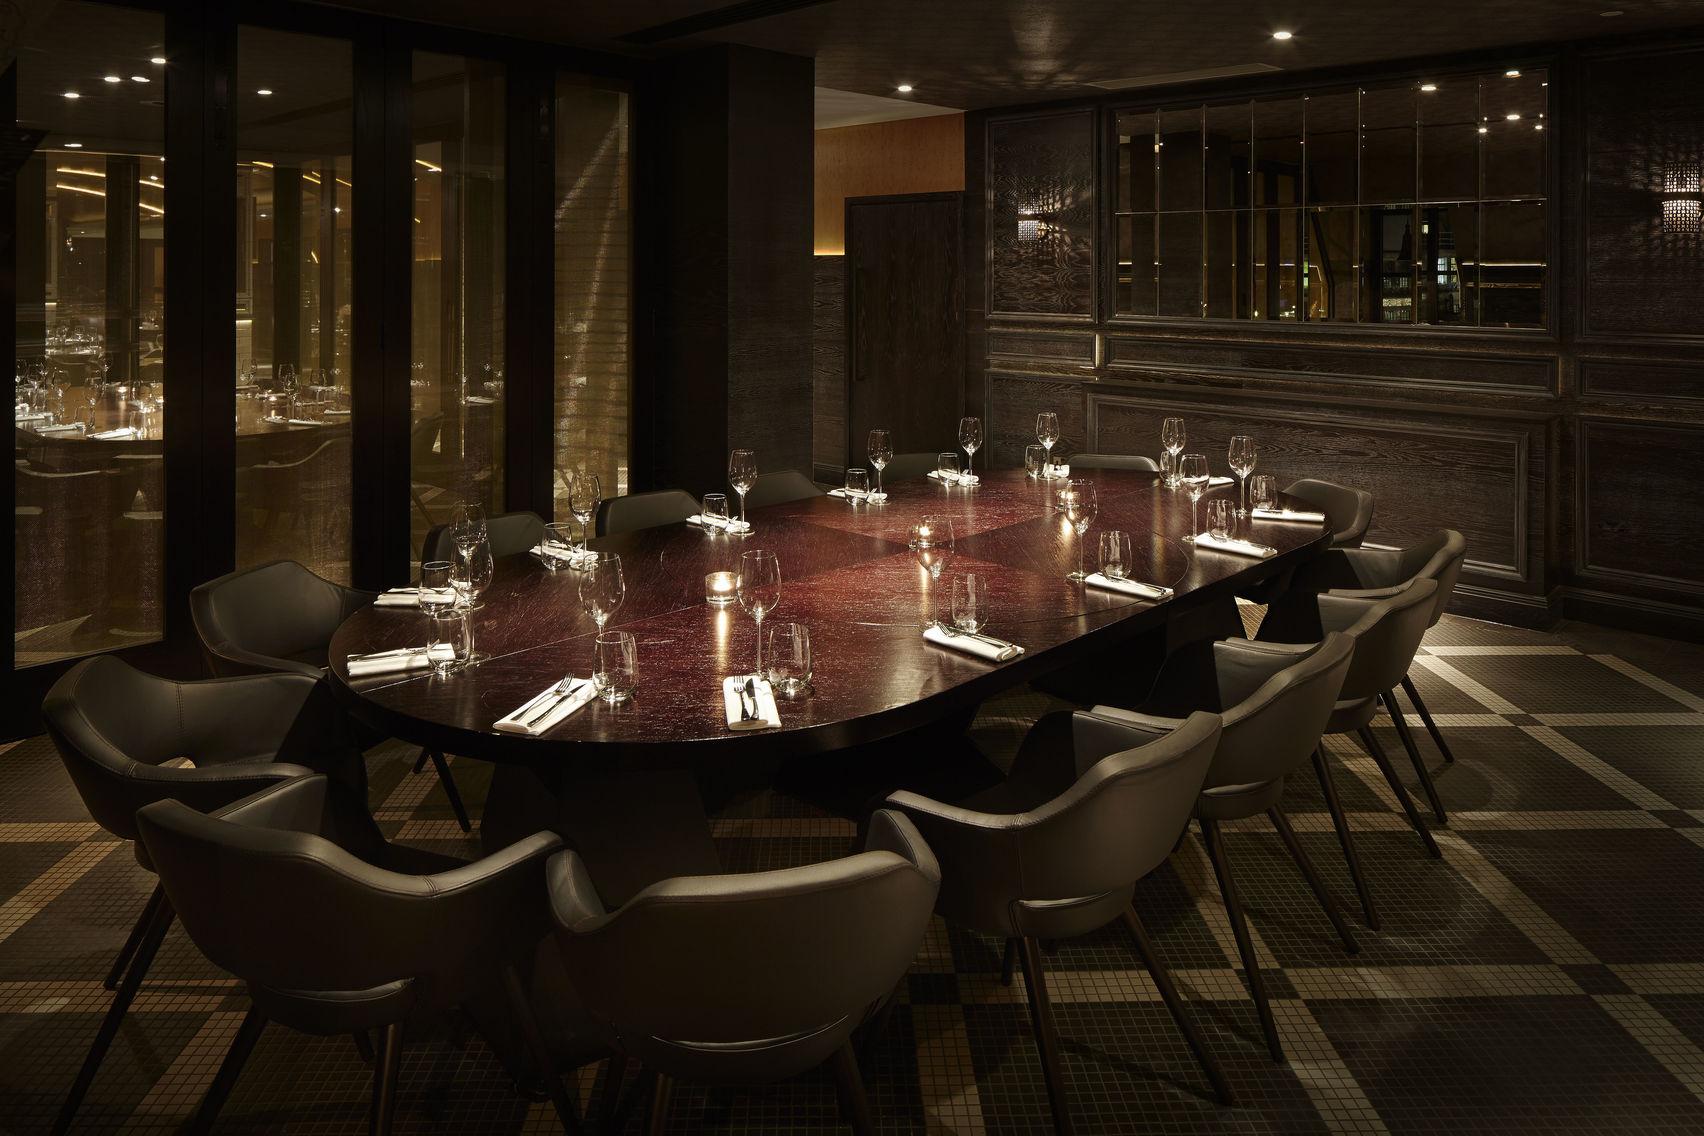 Book dinner sitting la casita aqua nueva london headbox for Best restaurants private dining rooms london